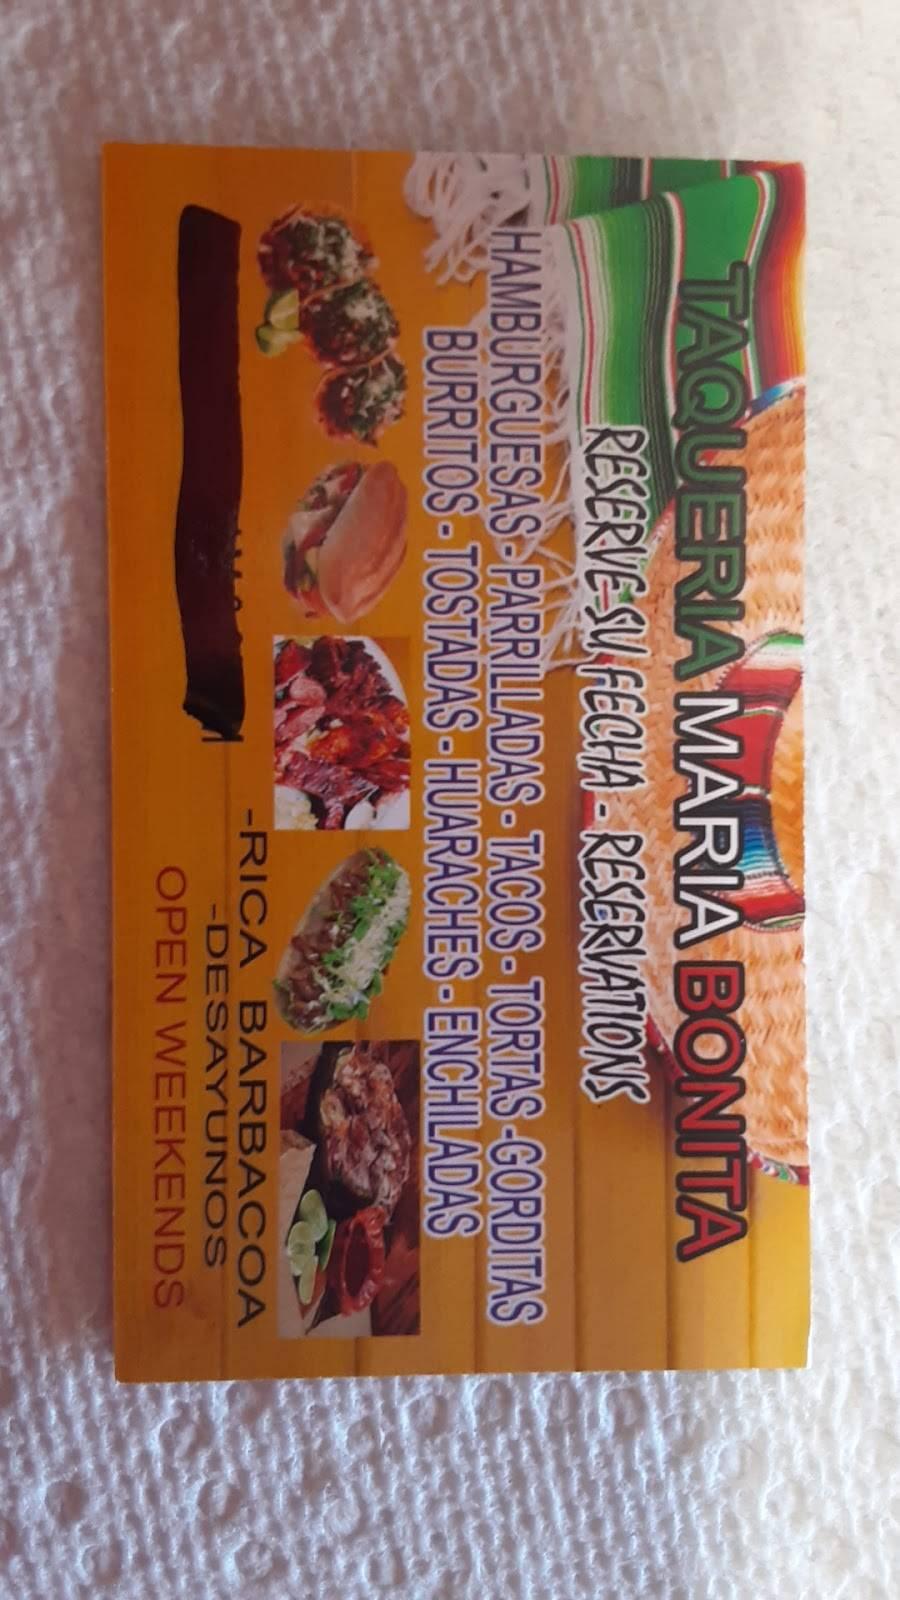 Taqueria Maria Bonita | restaurant | 21120 TX-105, Cleveland, TX 77328, USA | 9364439817 OR +1 936-443-9817